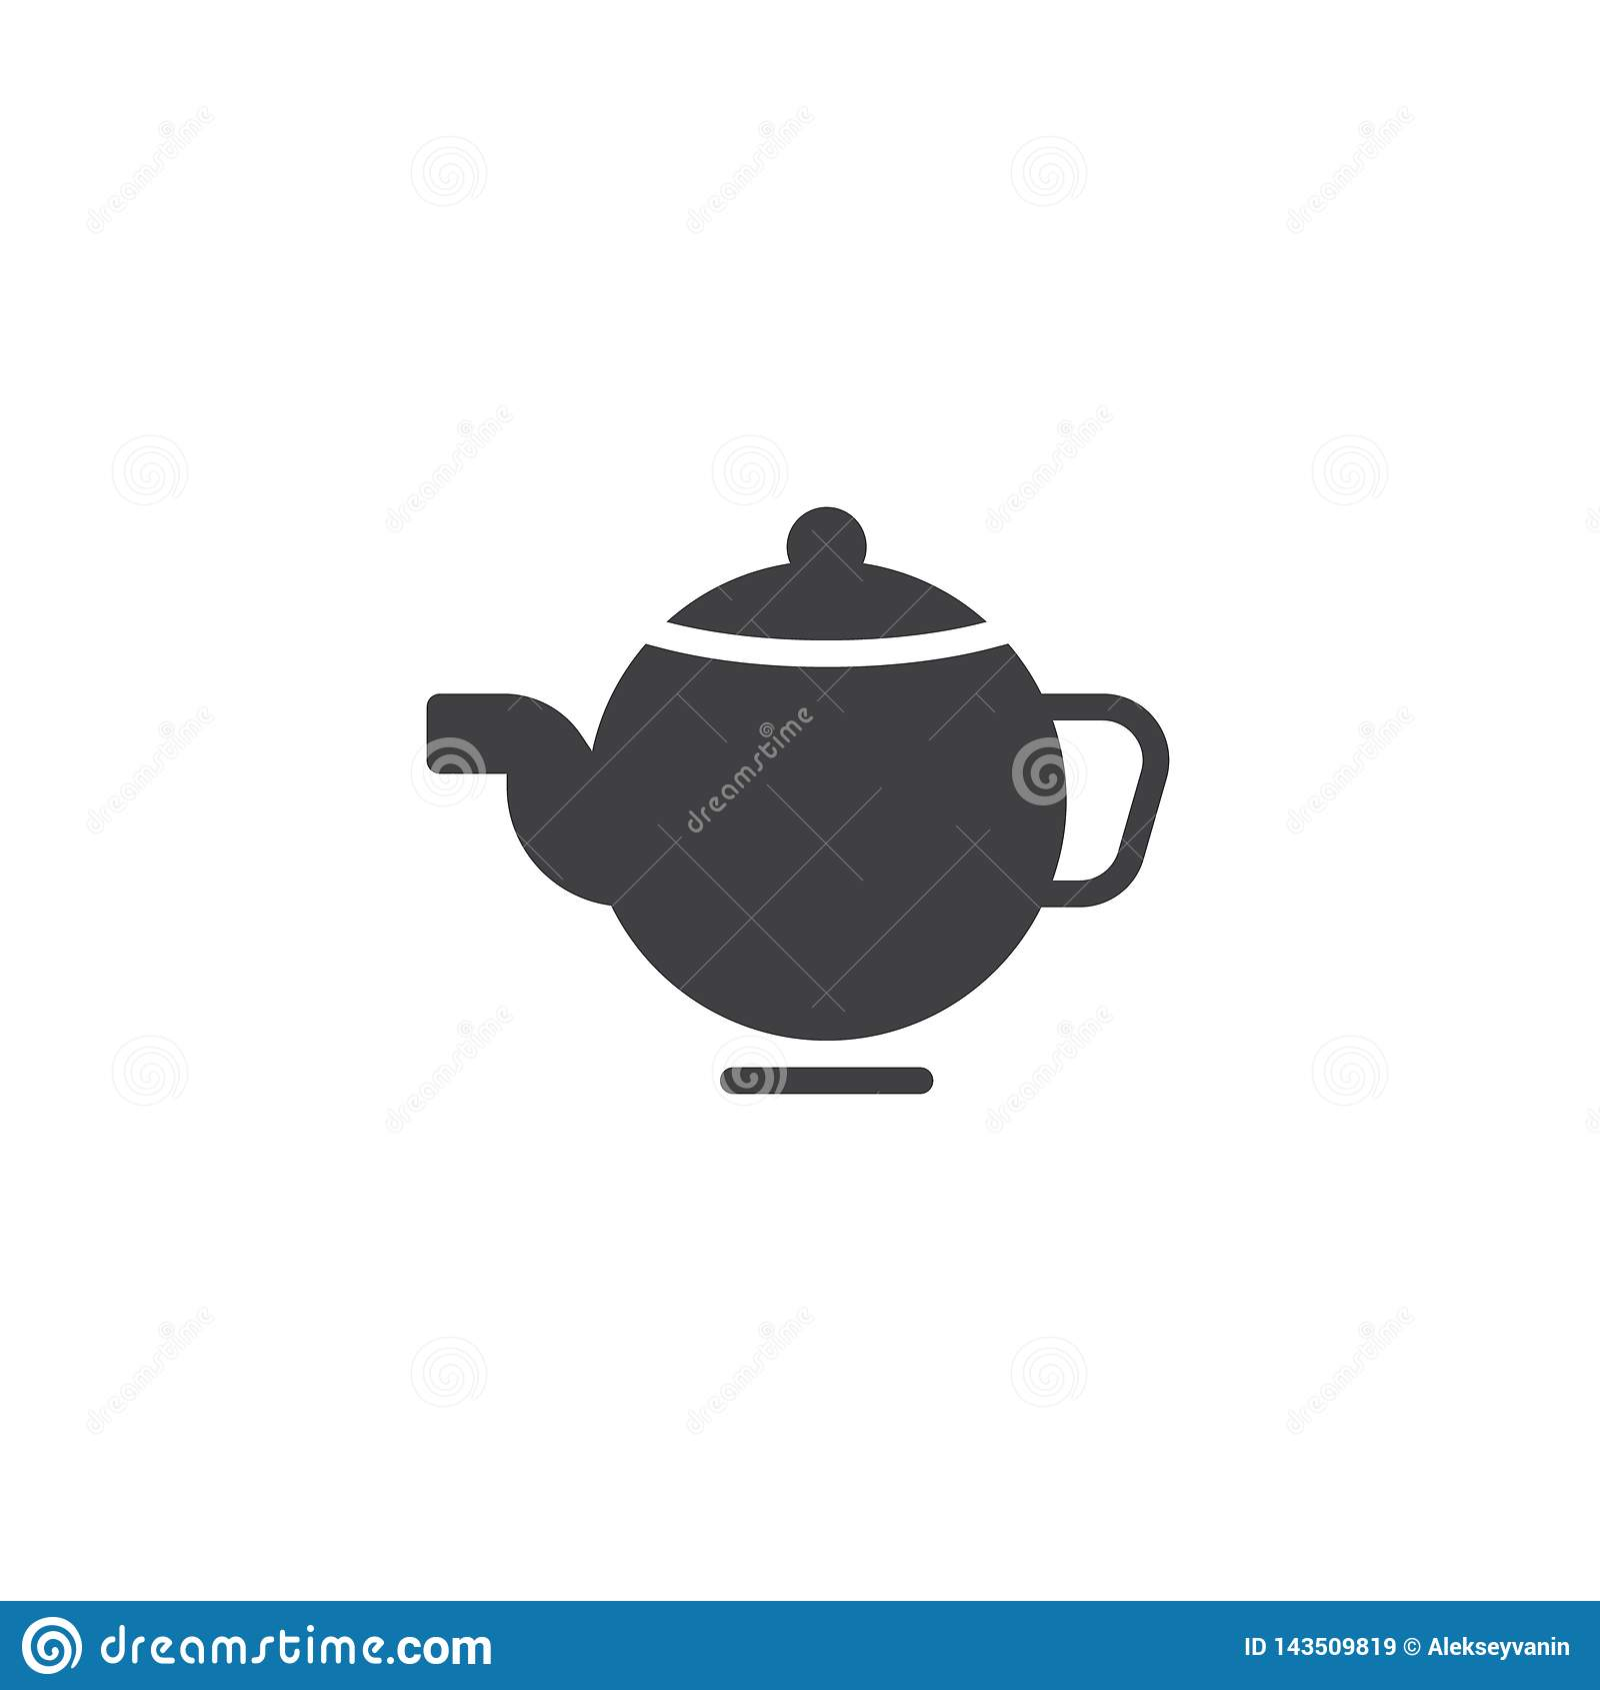 Tea pot vector icon stock vector. Illustration of graphics ...